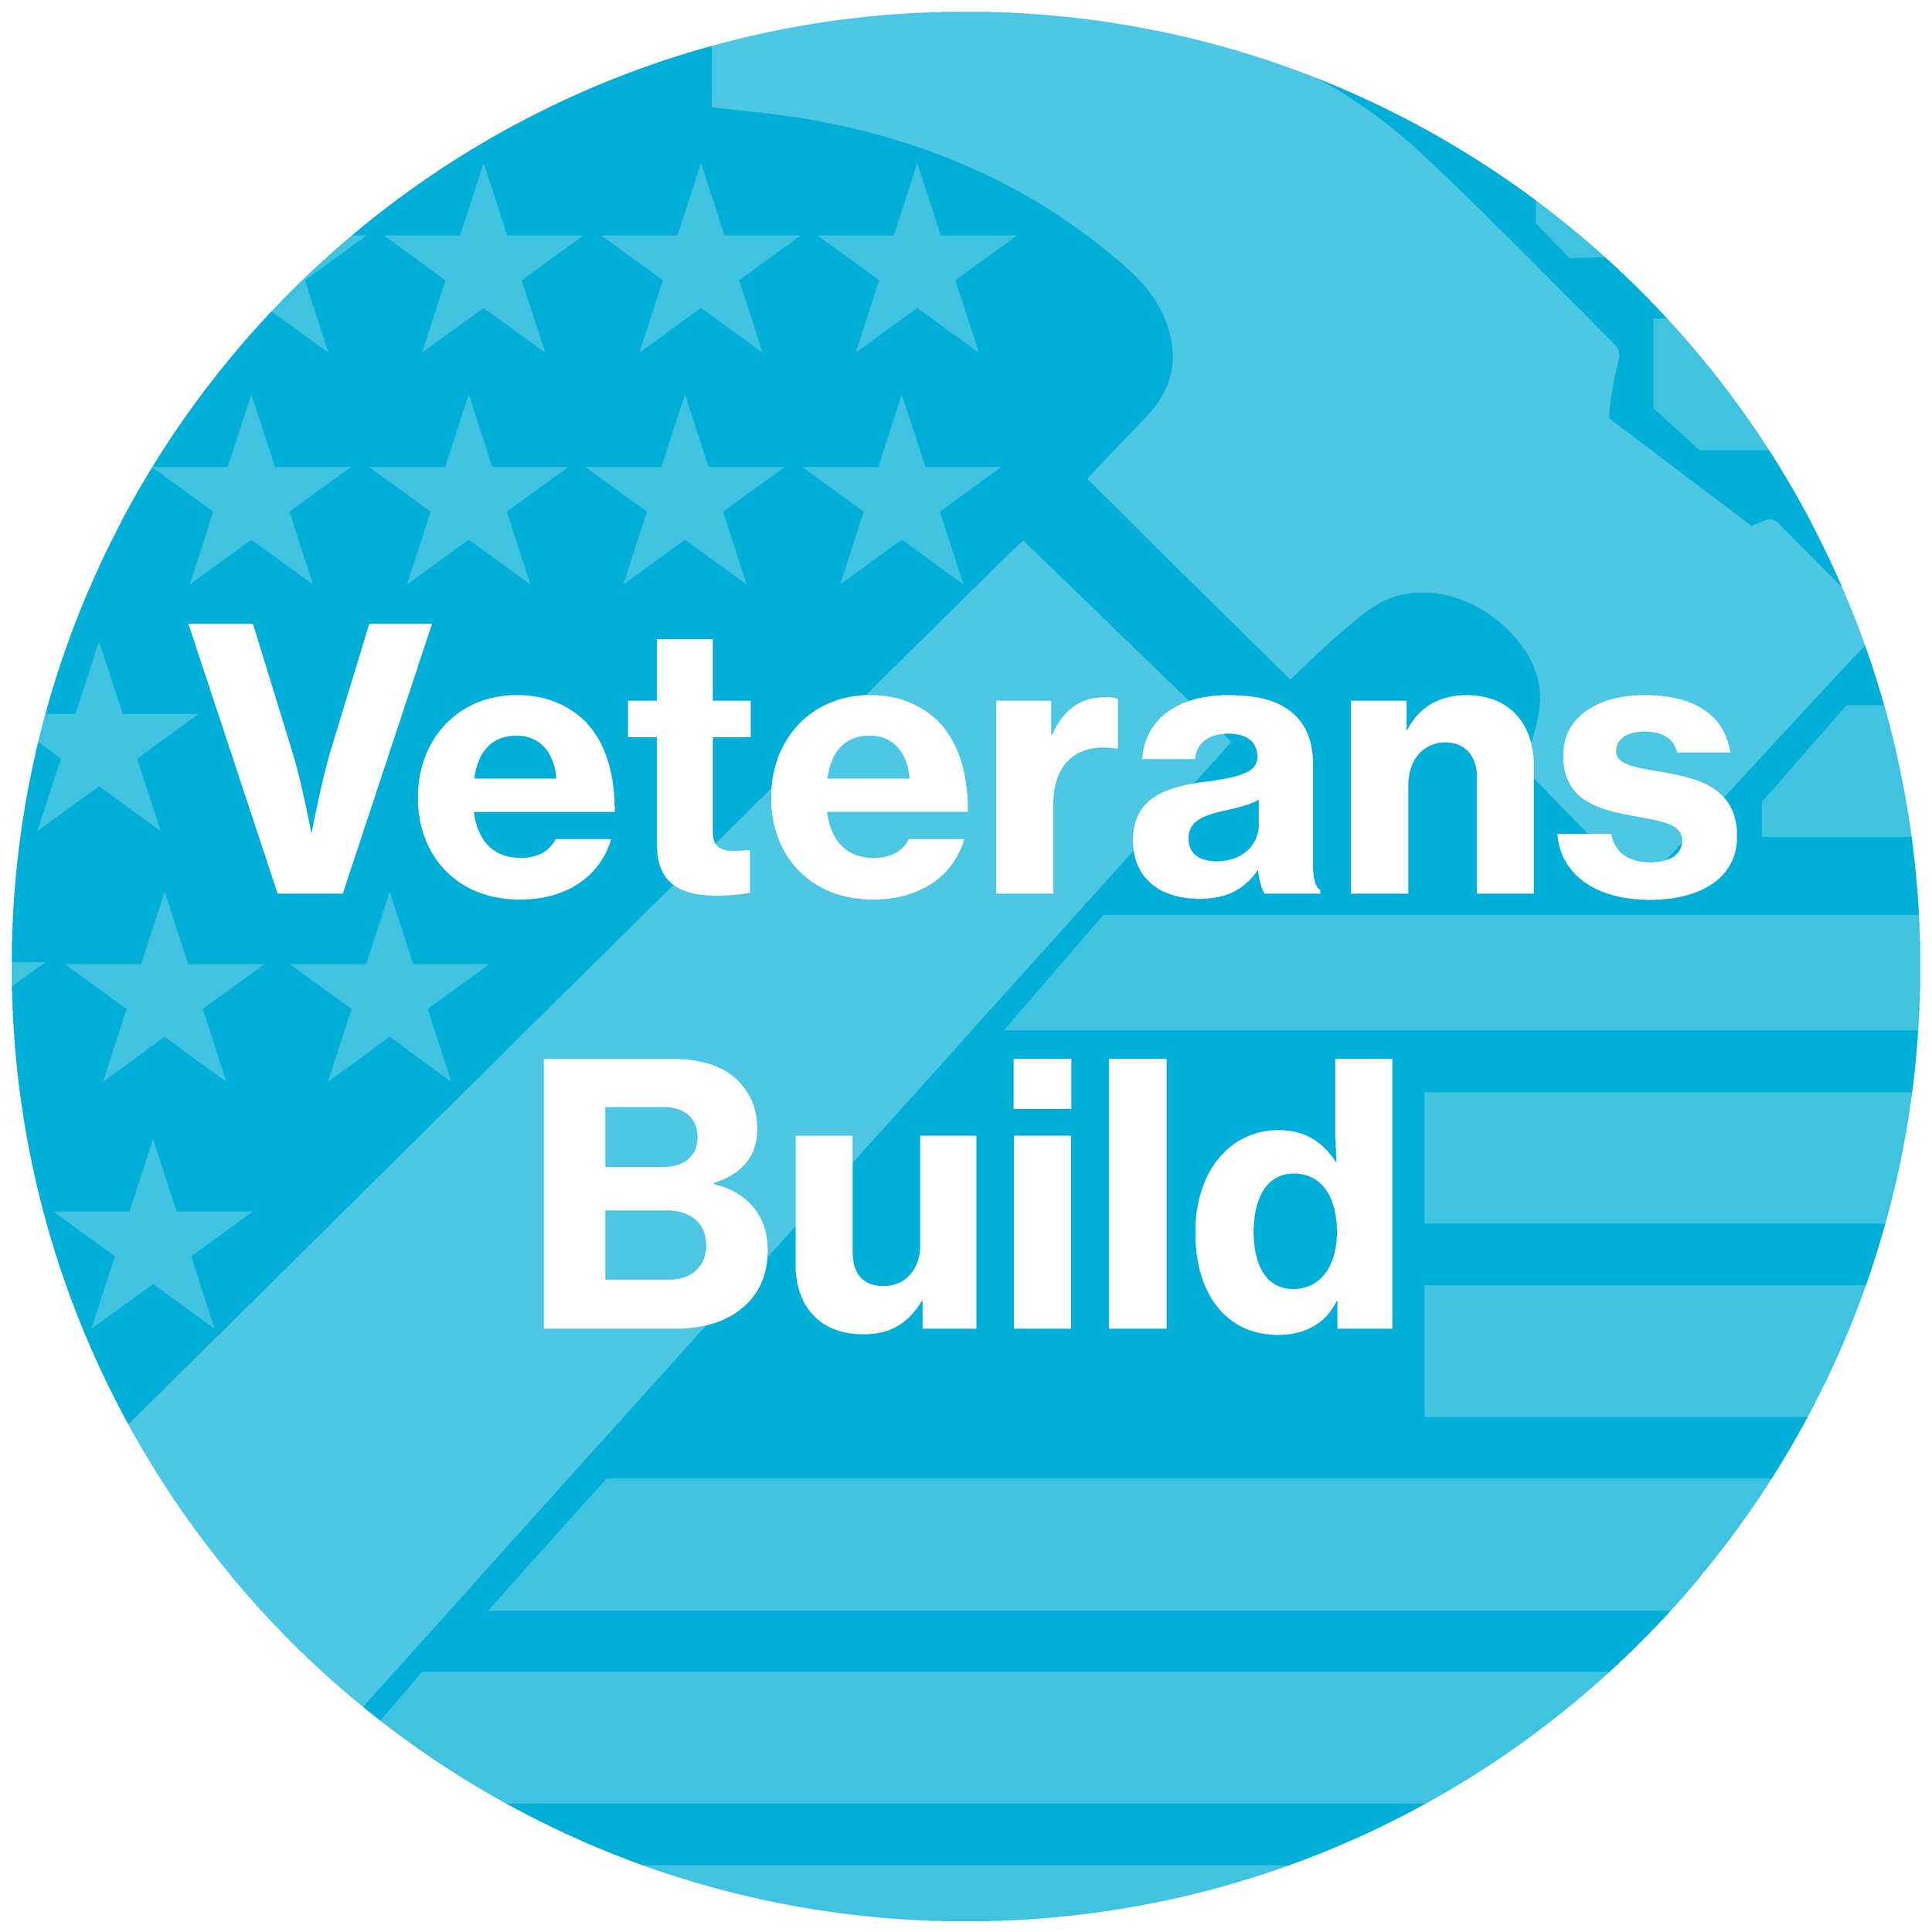 HFHDUC Veterans Build Logo